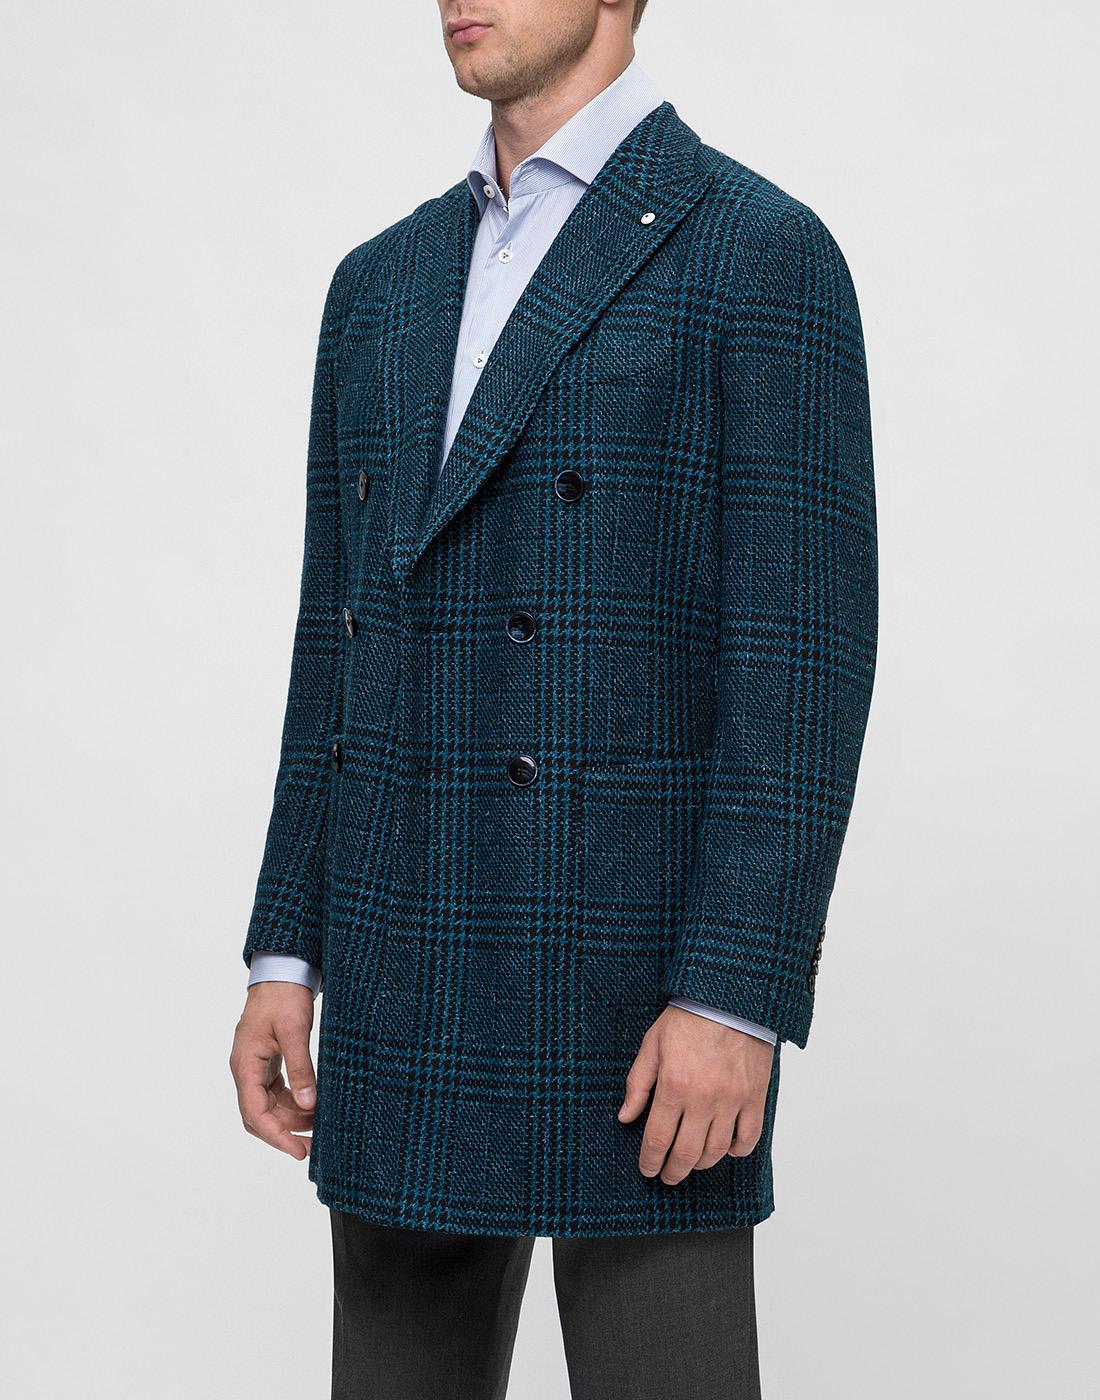 Мужское зеленое шерстяное пальто Lubiam S85086/6 7468-3